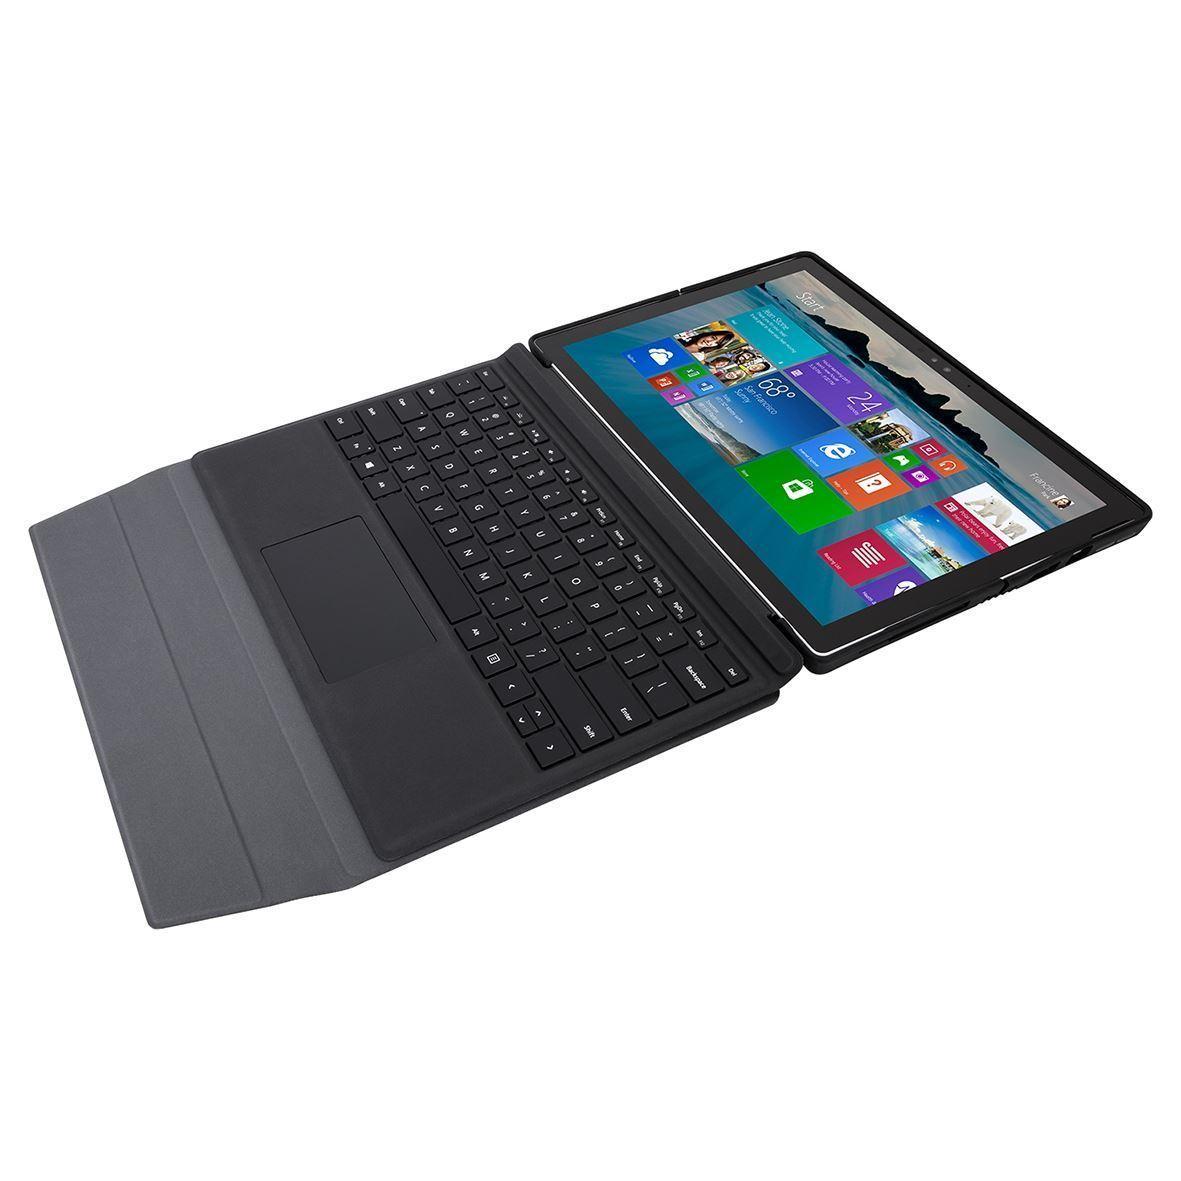 Folio Wrap + Stand for Microsoft Surface Pro 4 (THZ618GL) - Flat